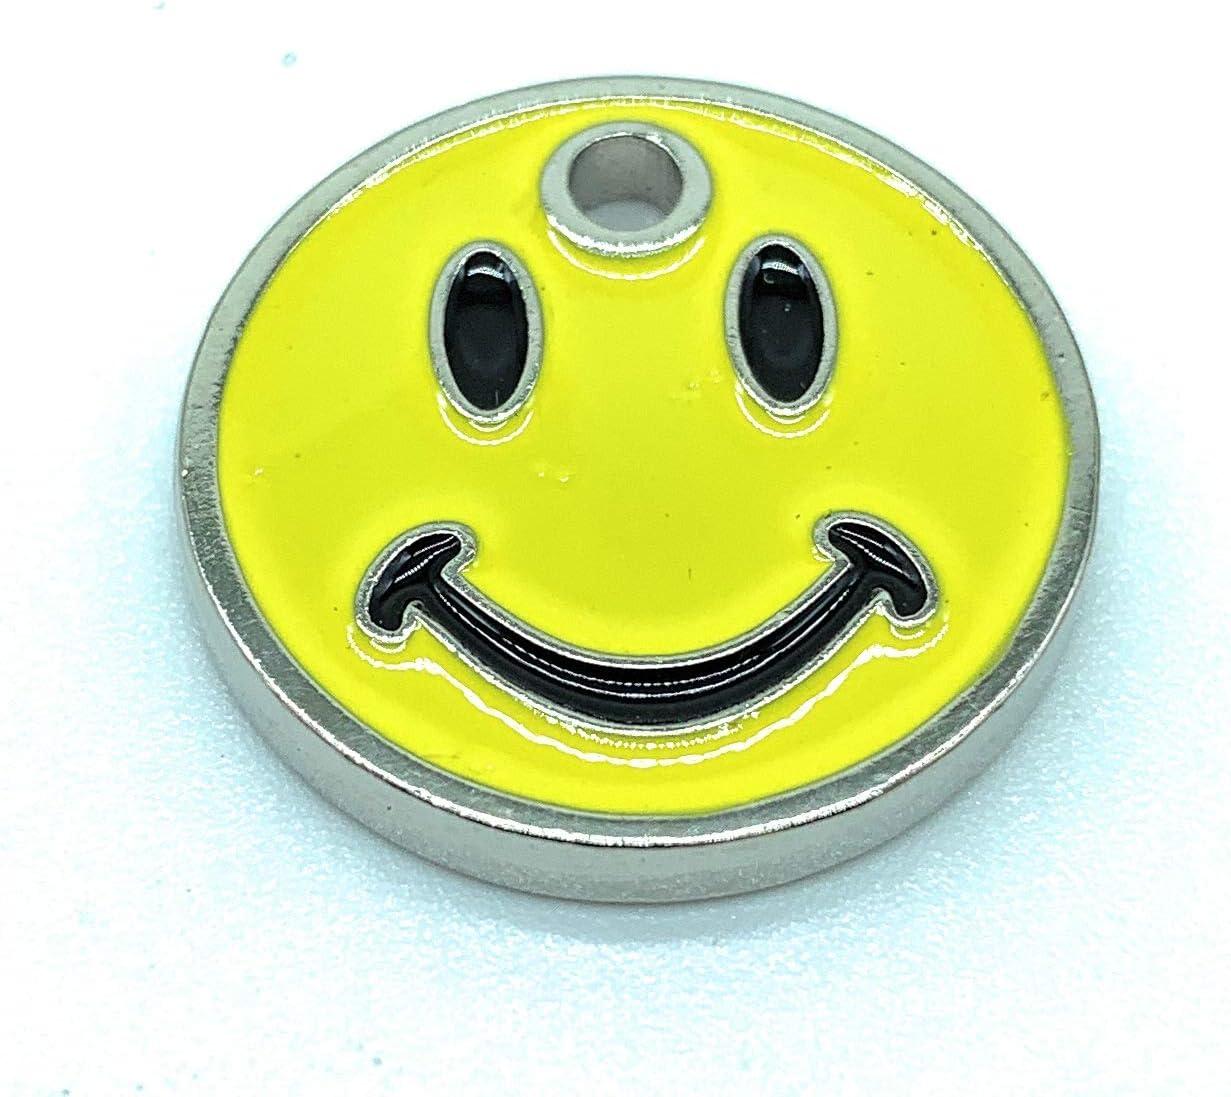 2 x Smiley Face Round Coin Trolley Token Keyring /£1